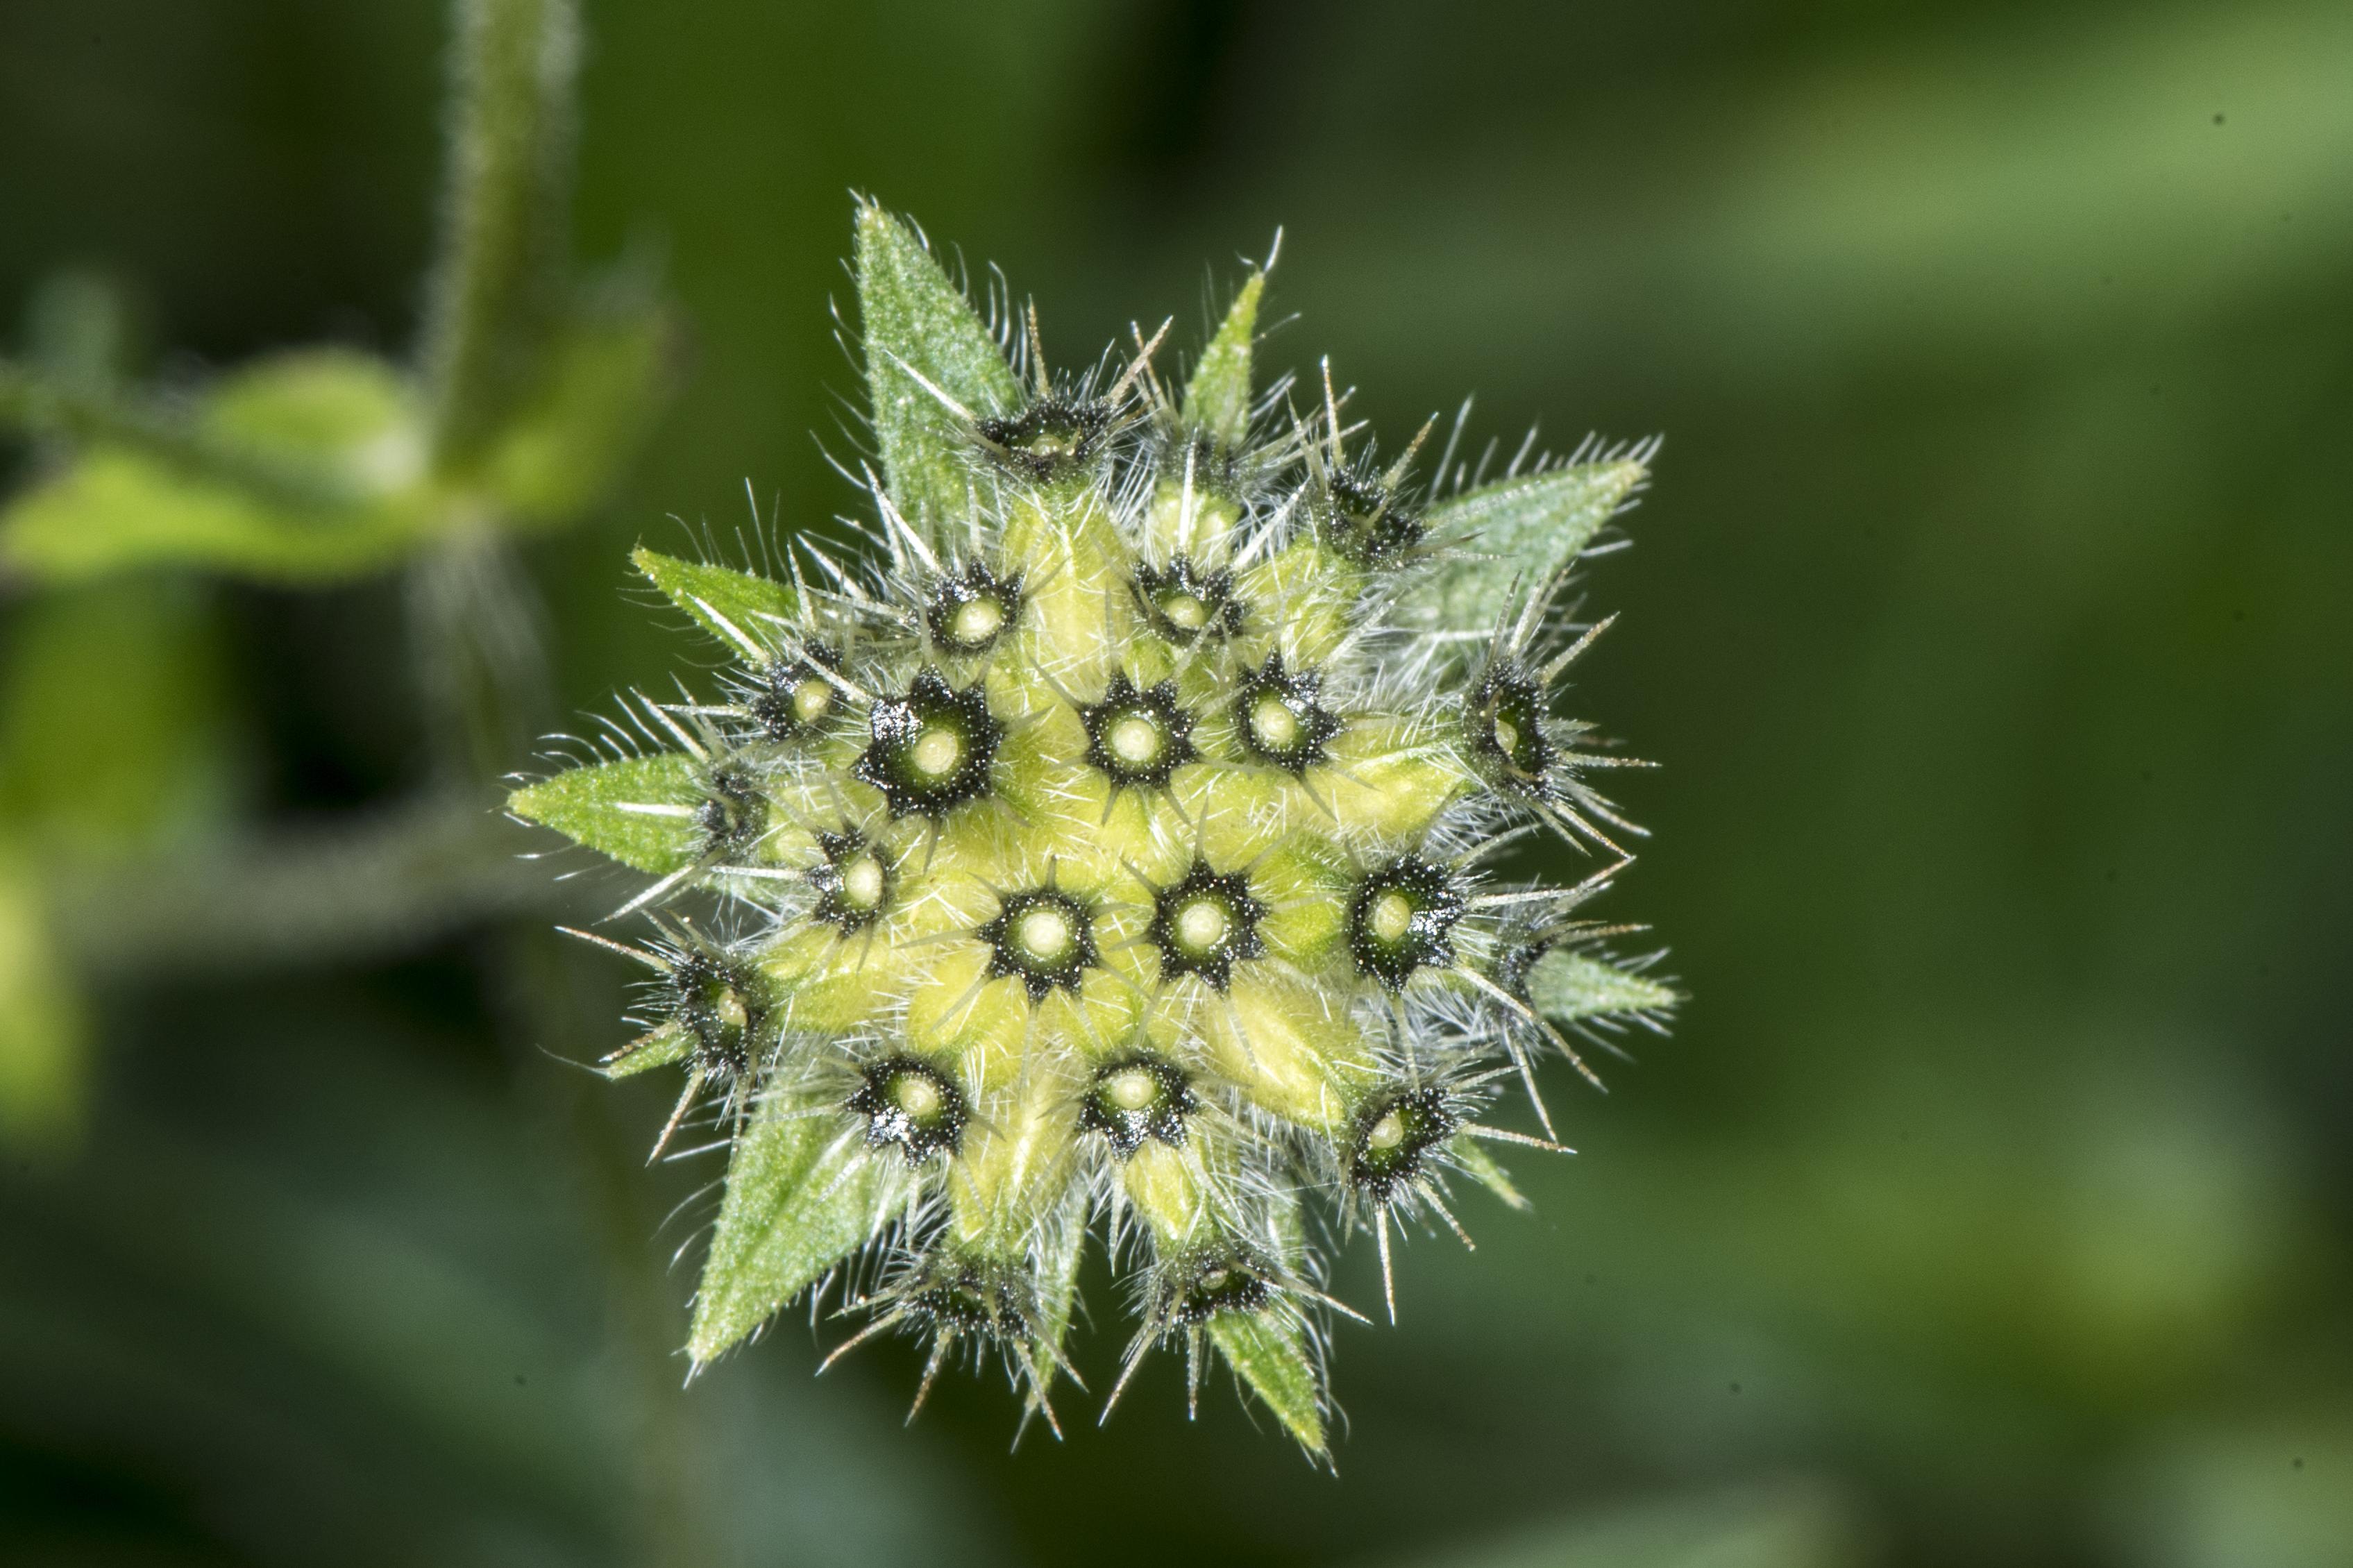 Knautia arvensis (L.) Coult.